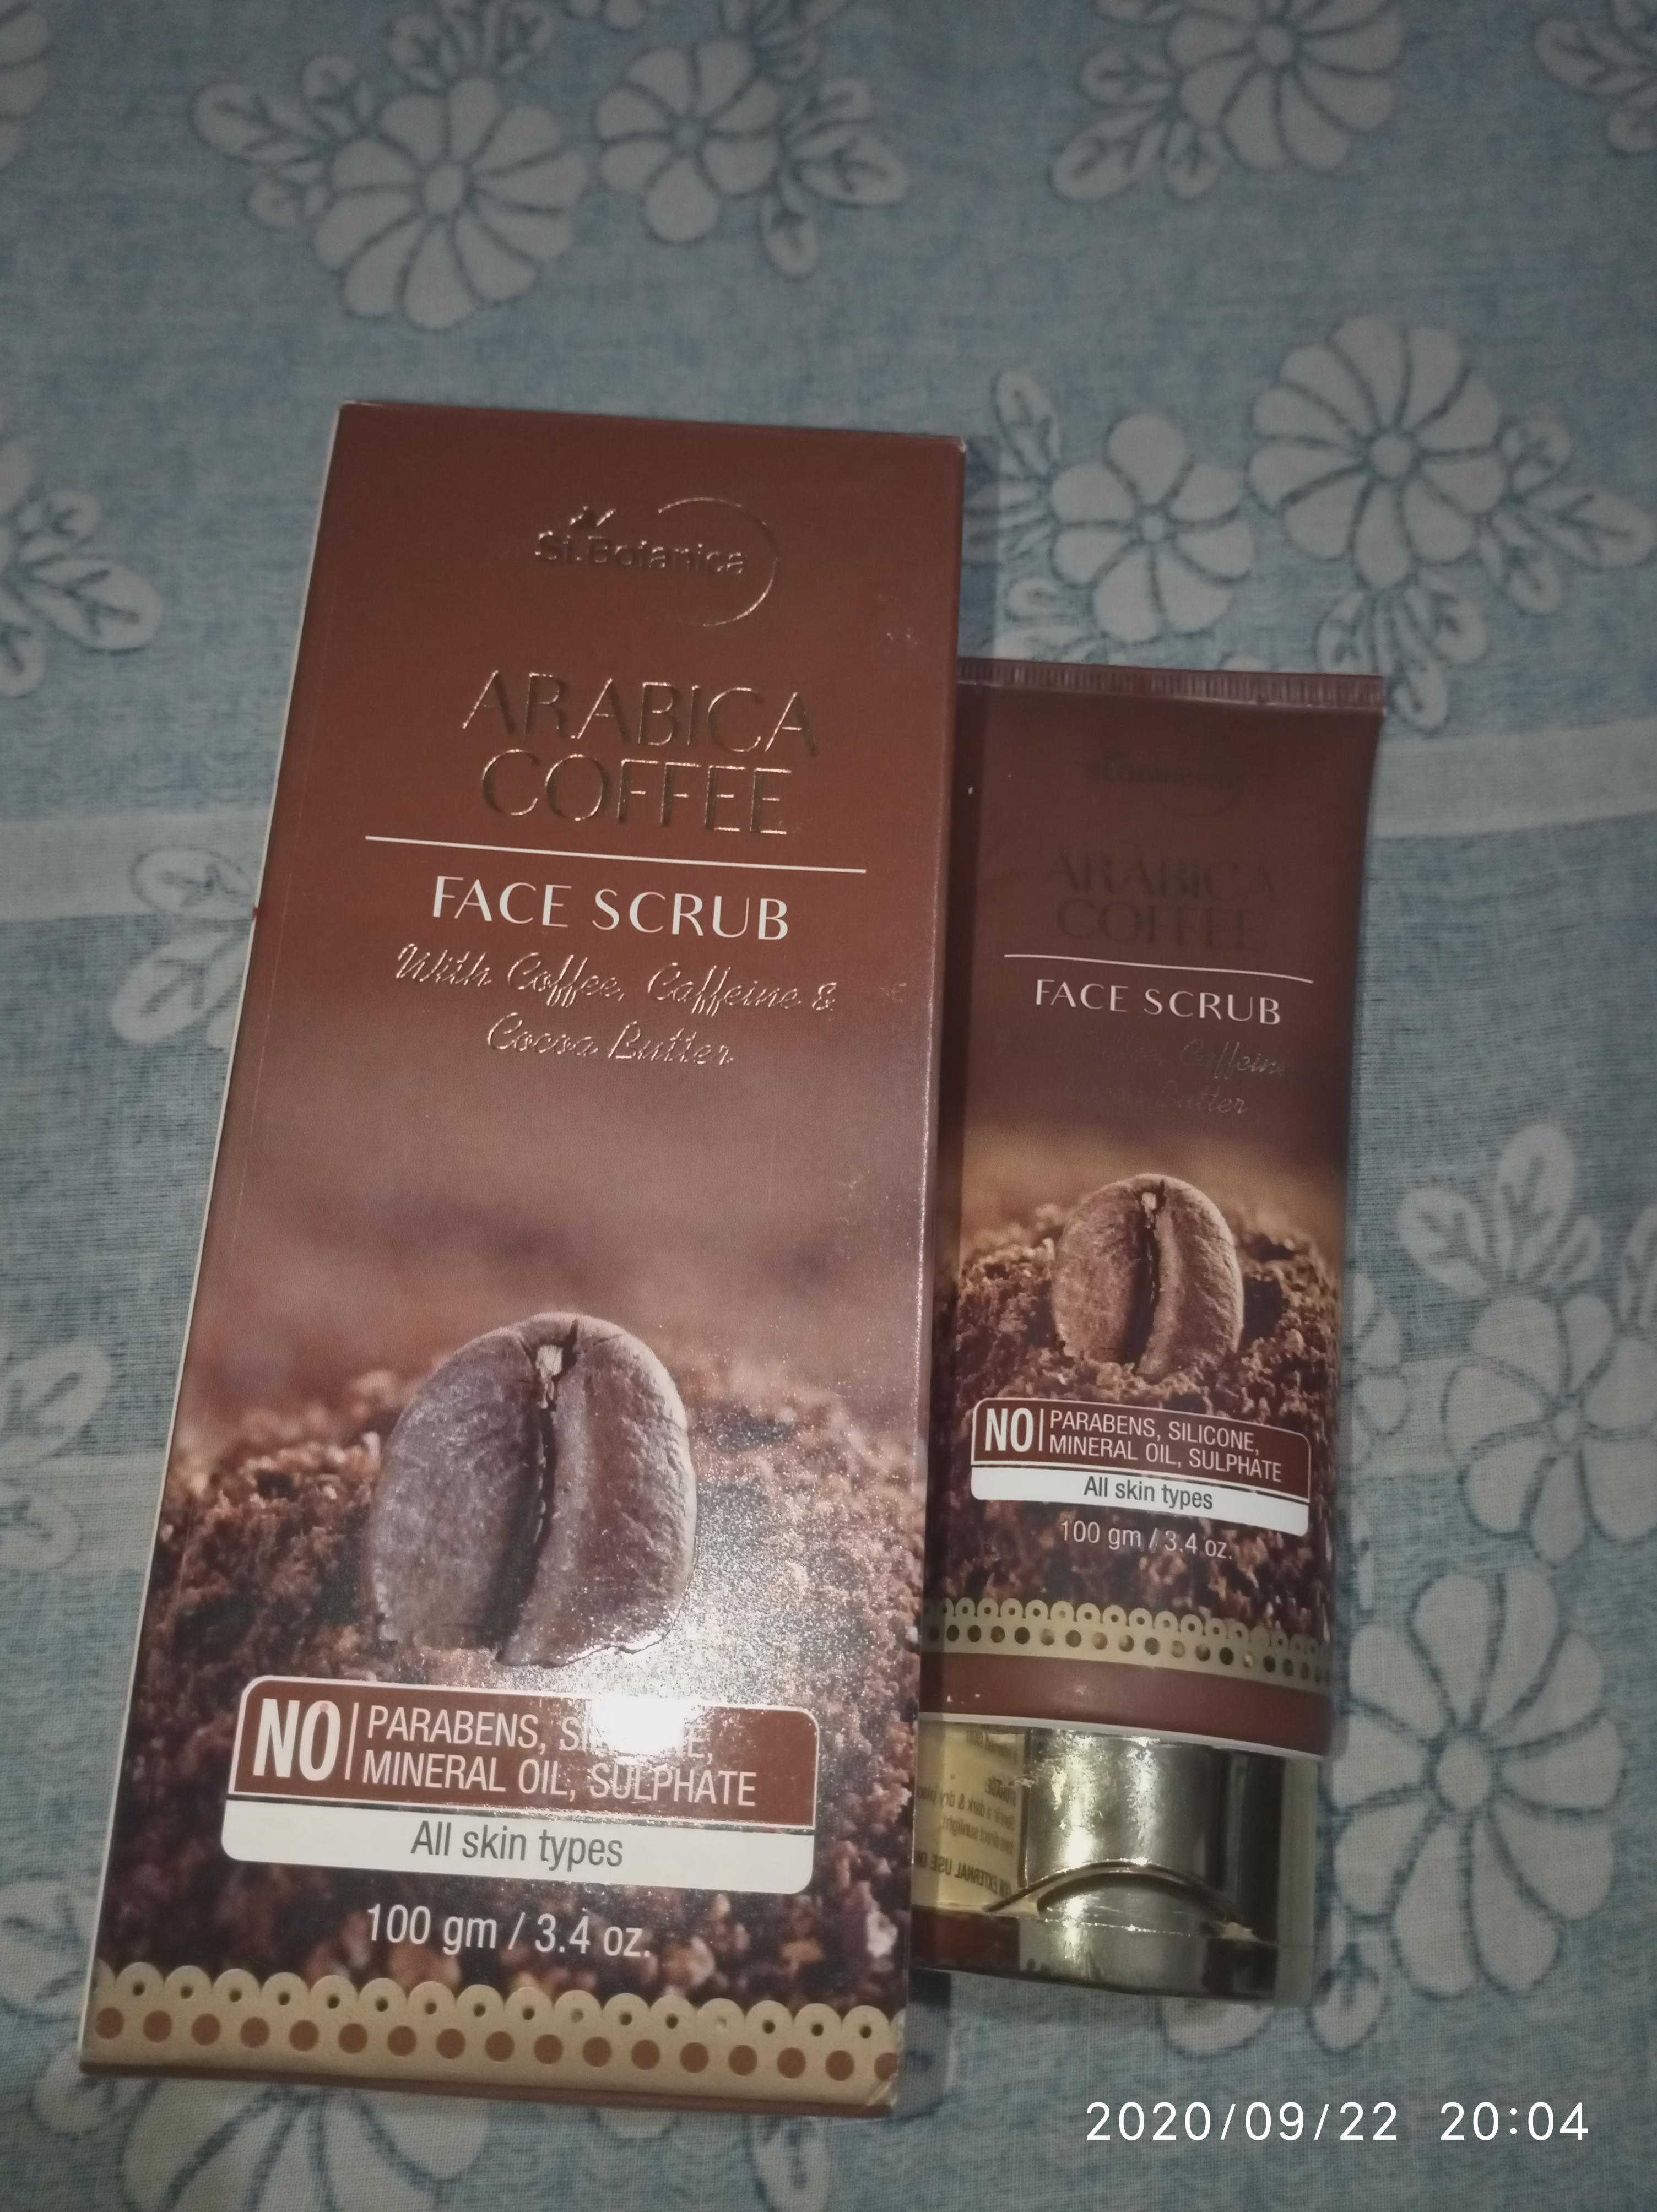 St.Botanica Arabica Coffee Face Scrub-Amazing products-By kumari_nisha